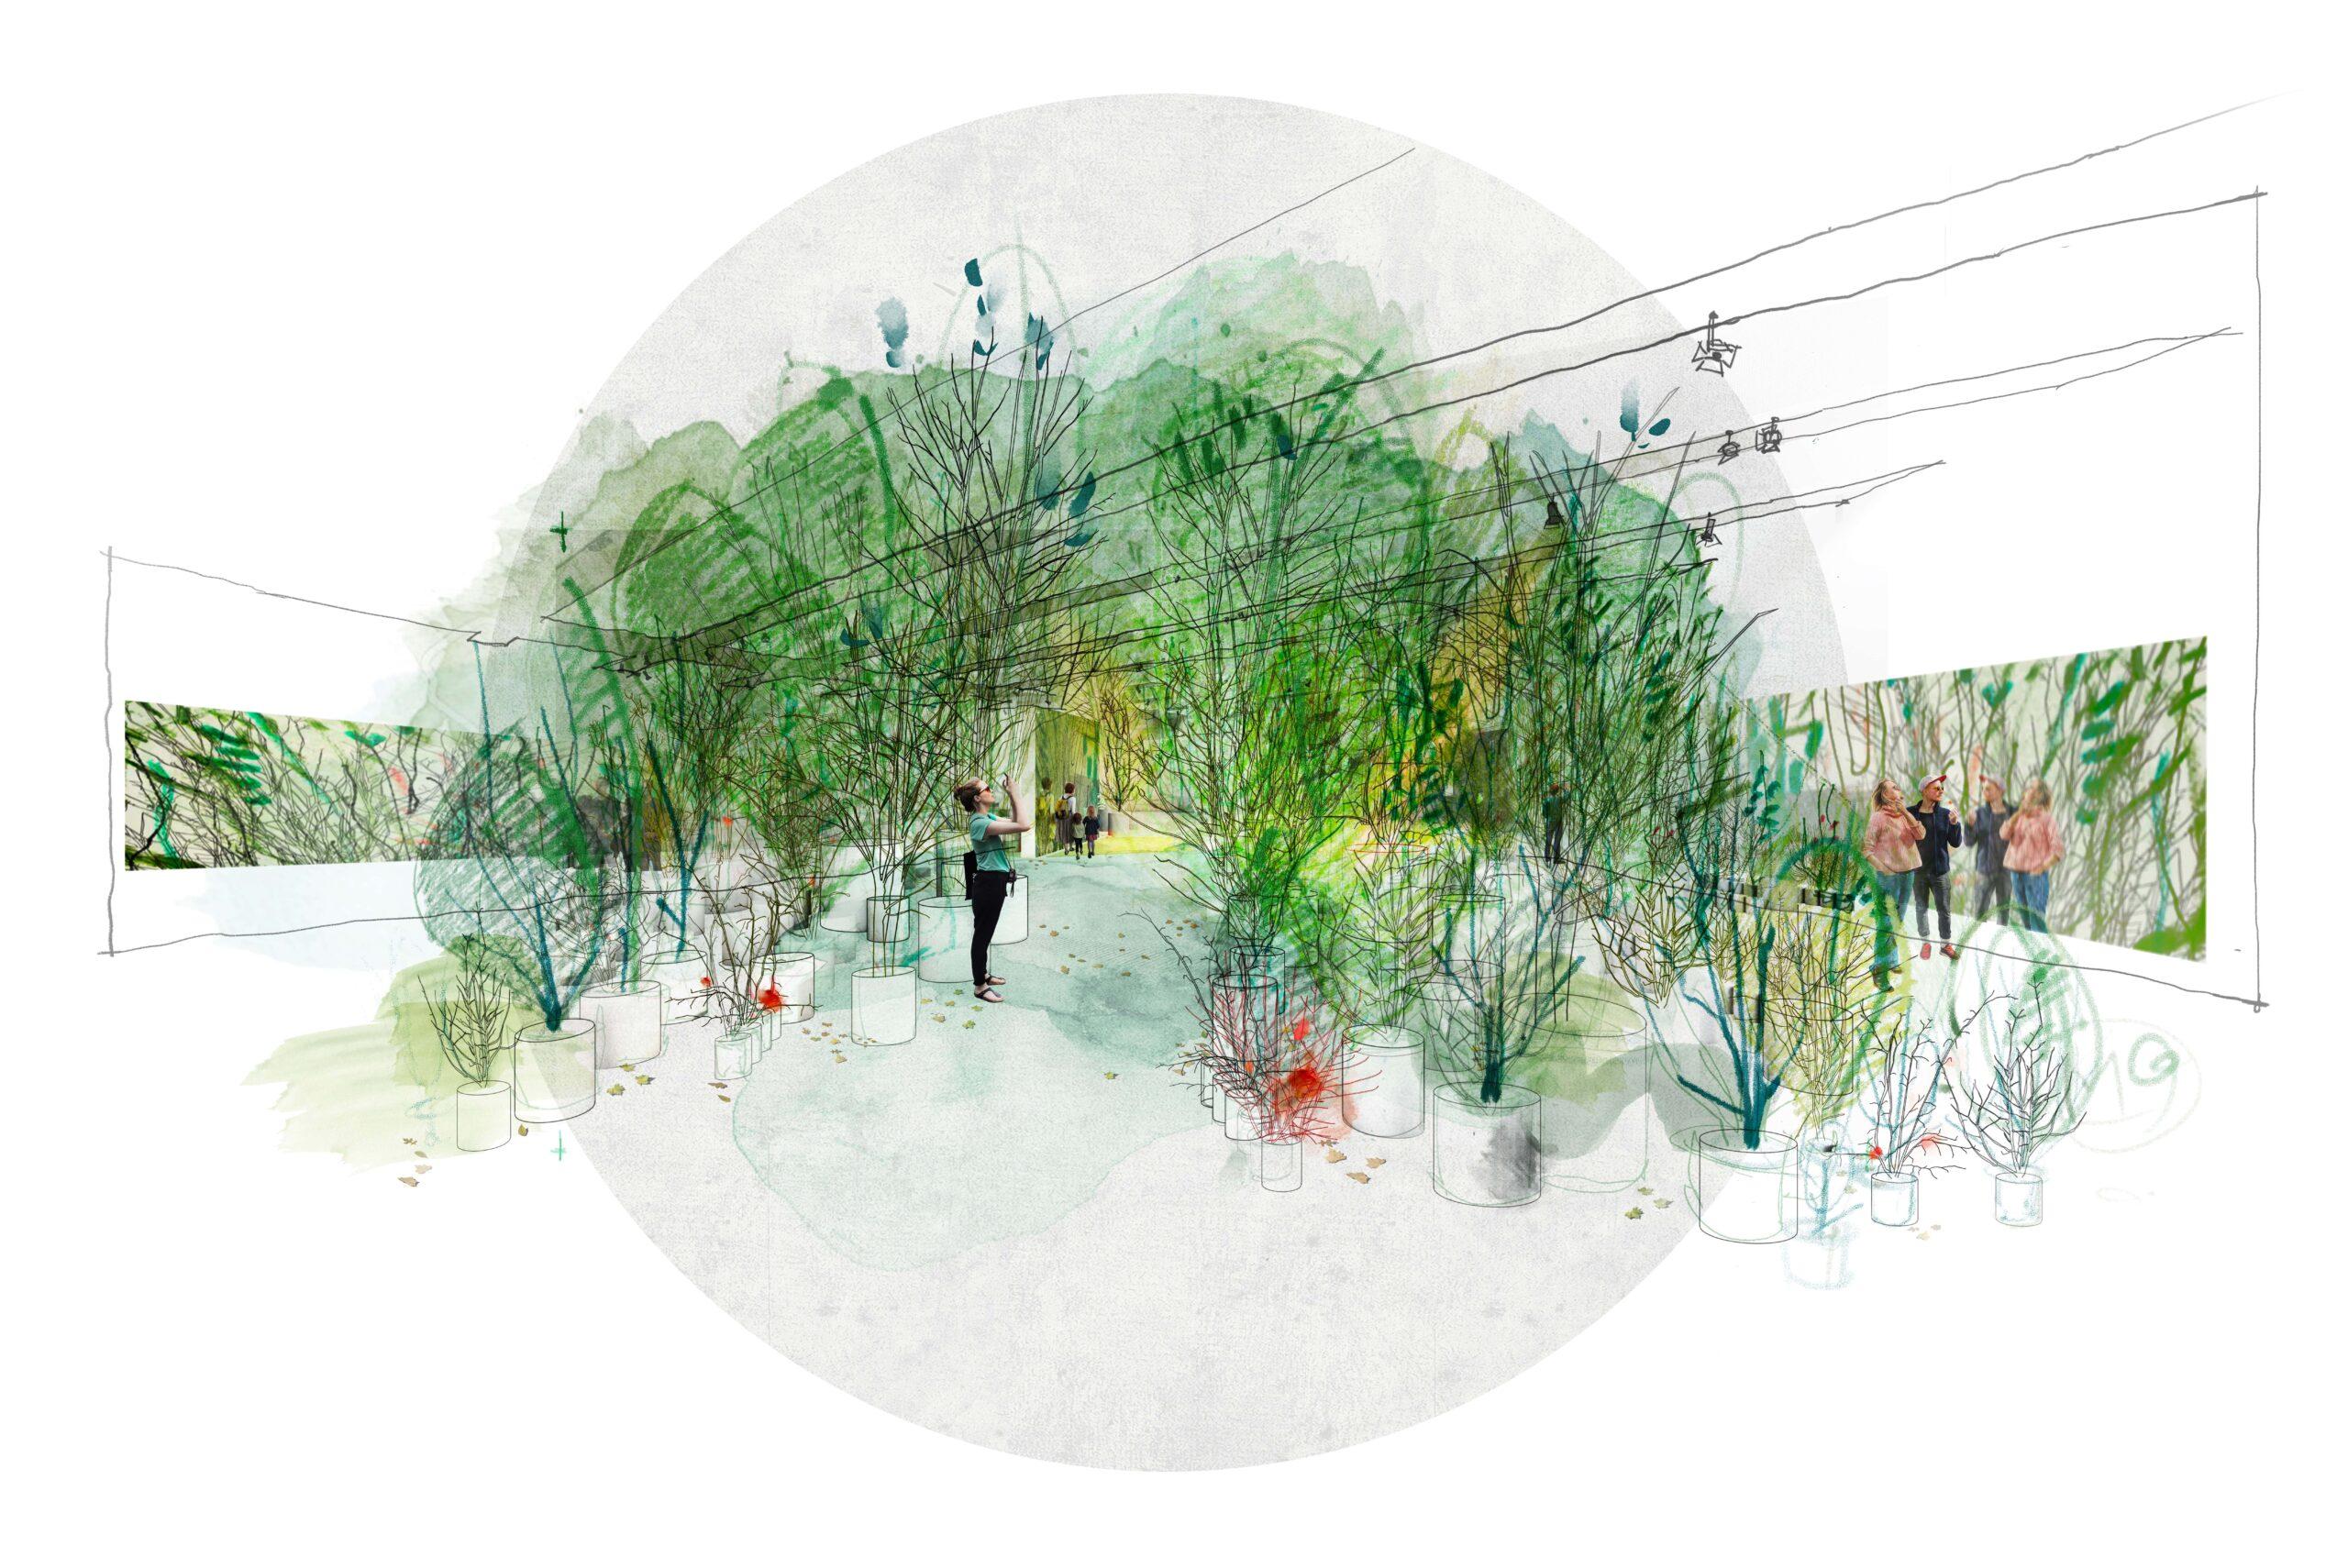 'Foresta M9' inaugura a Venezia Mestre: tra green ecology e 600 essenze arboree